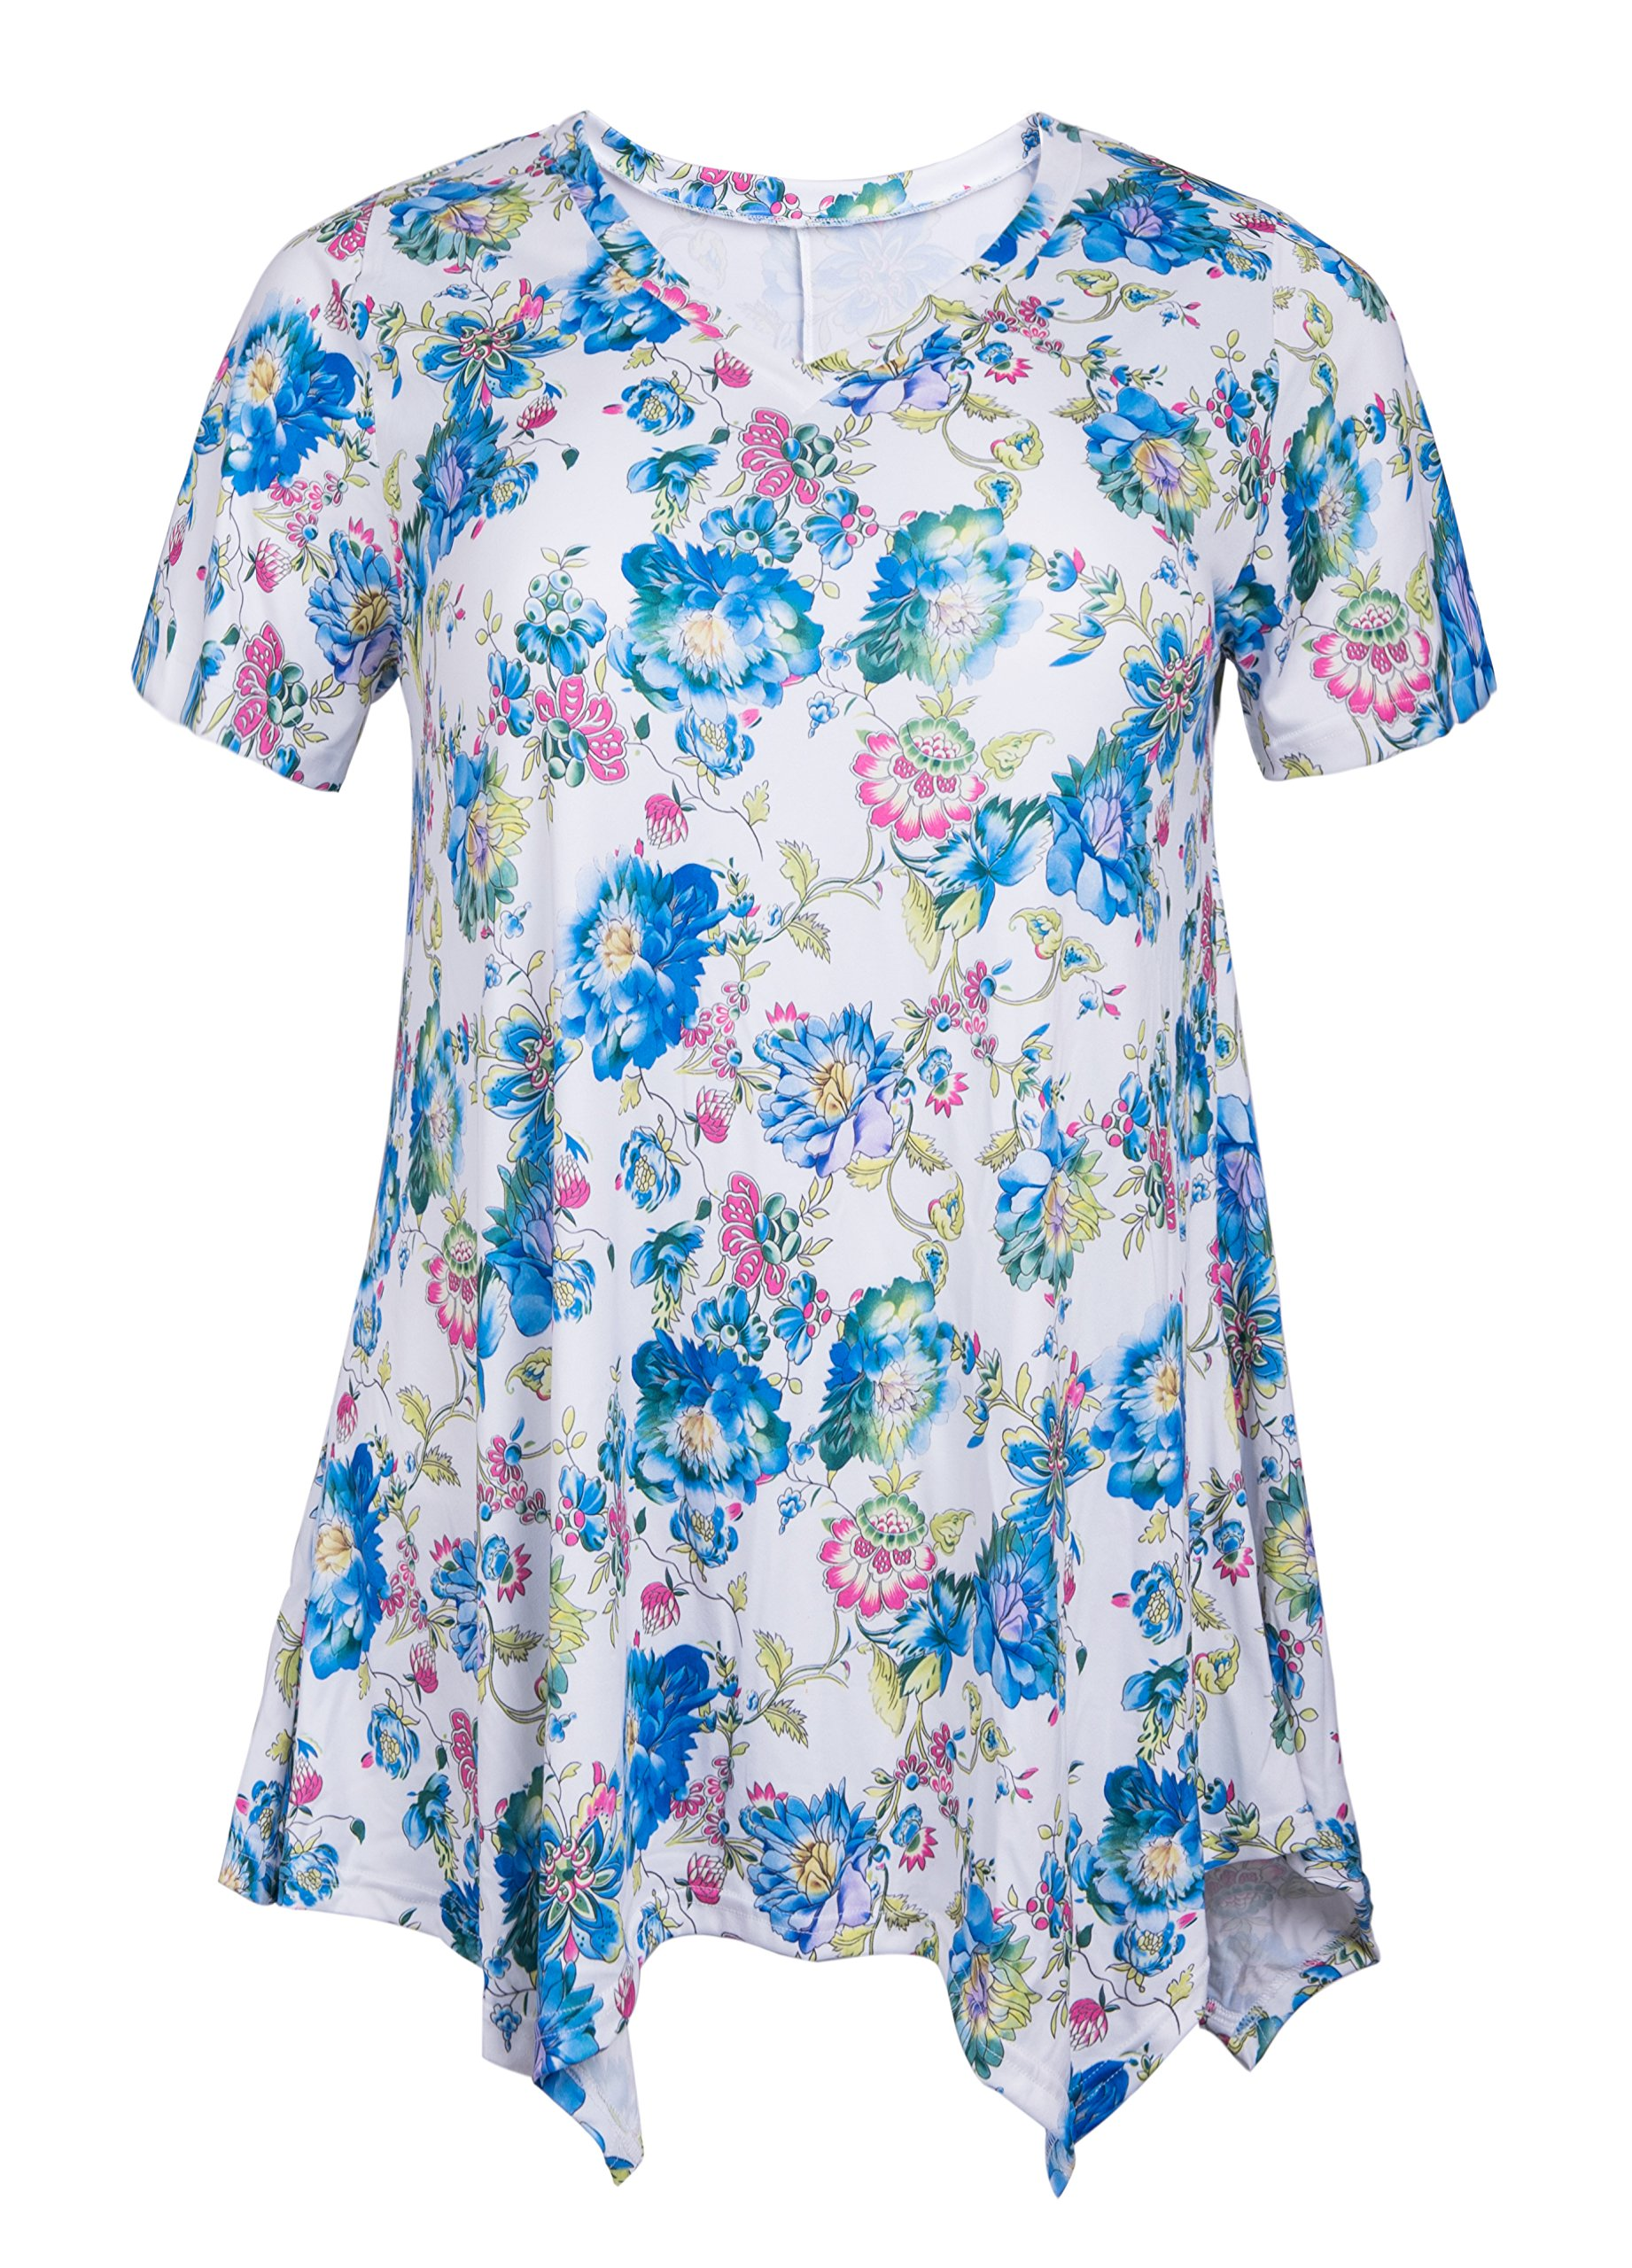 ZERDOCEAN Women Plus Size Printed Short Sleeves Tunic Tops Flowy T Shirt Style-813 4X